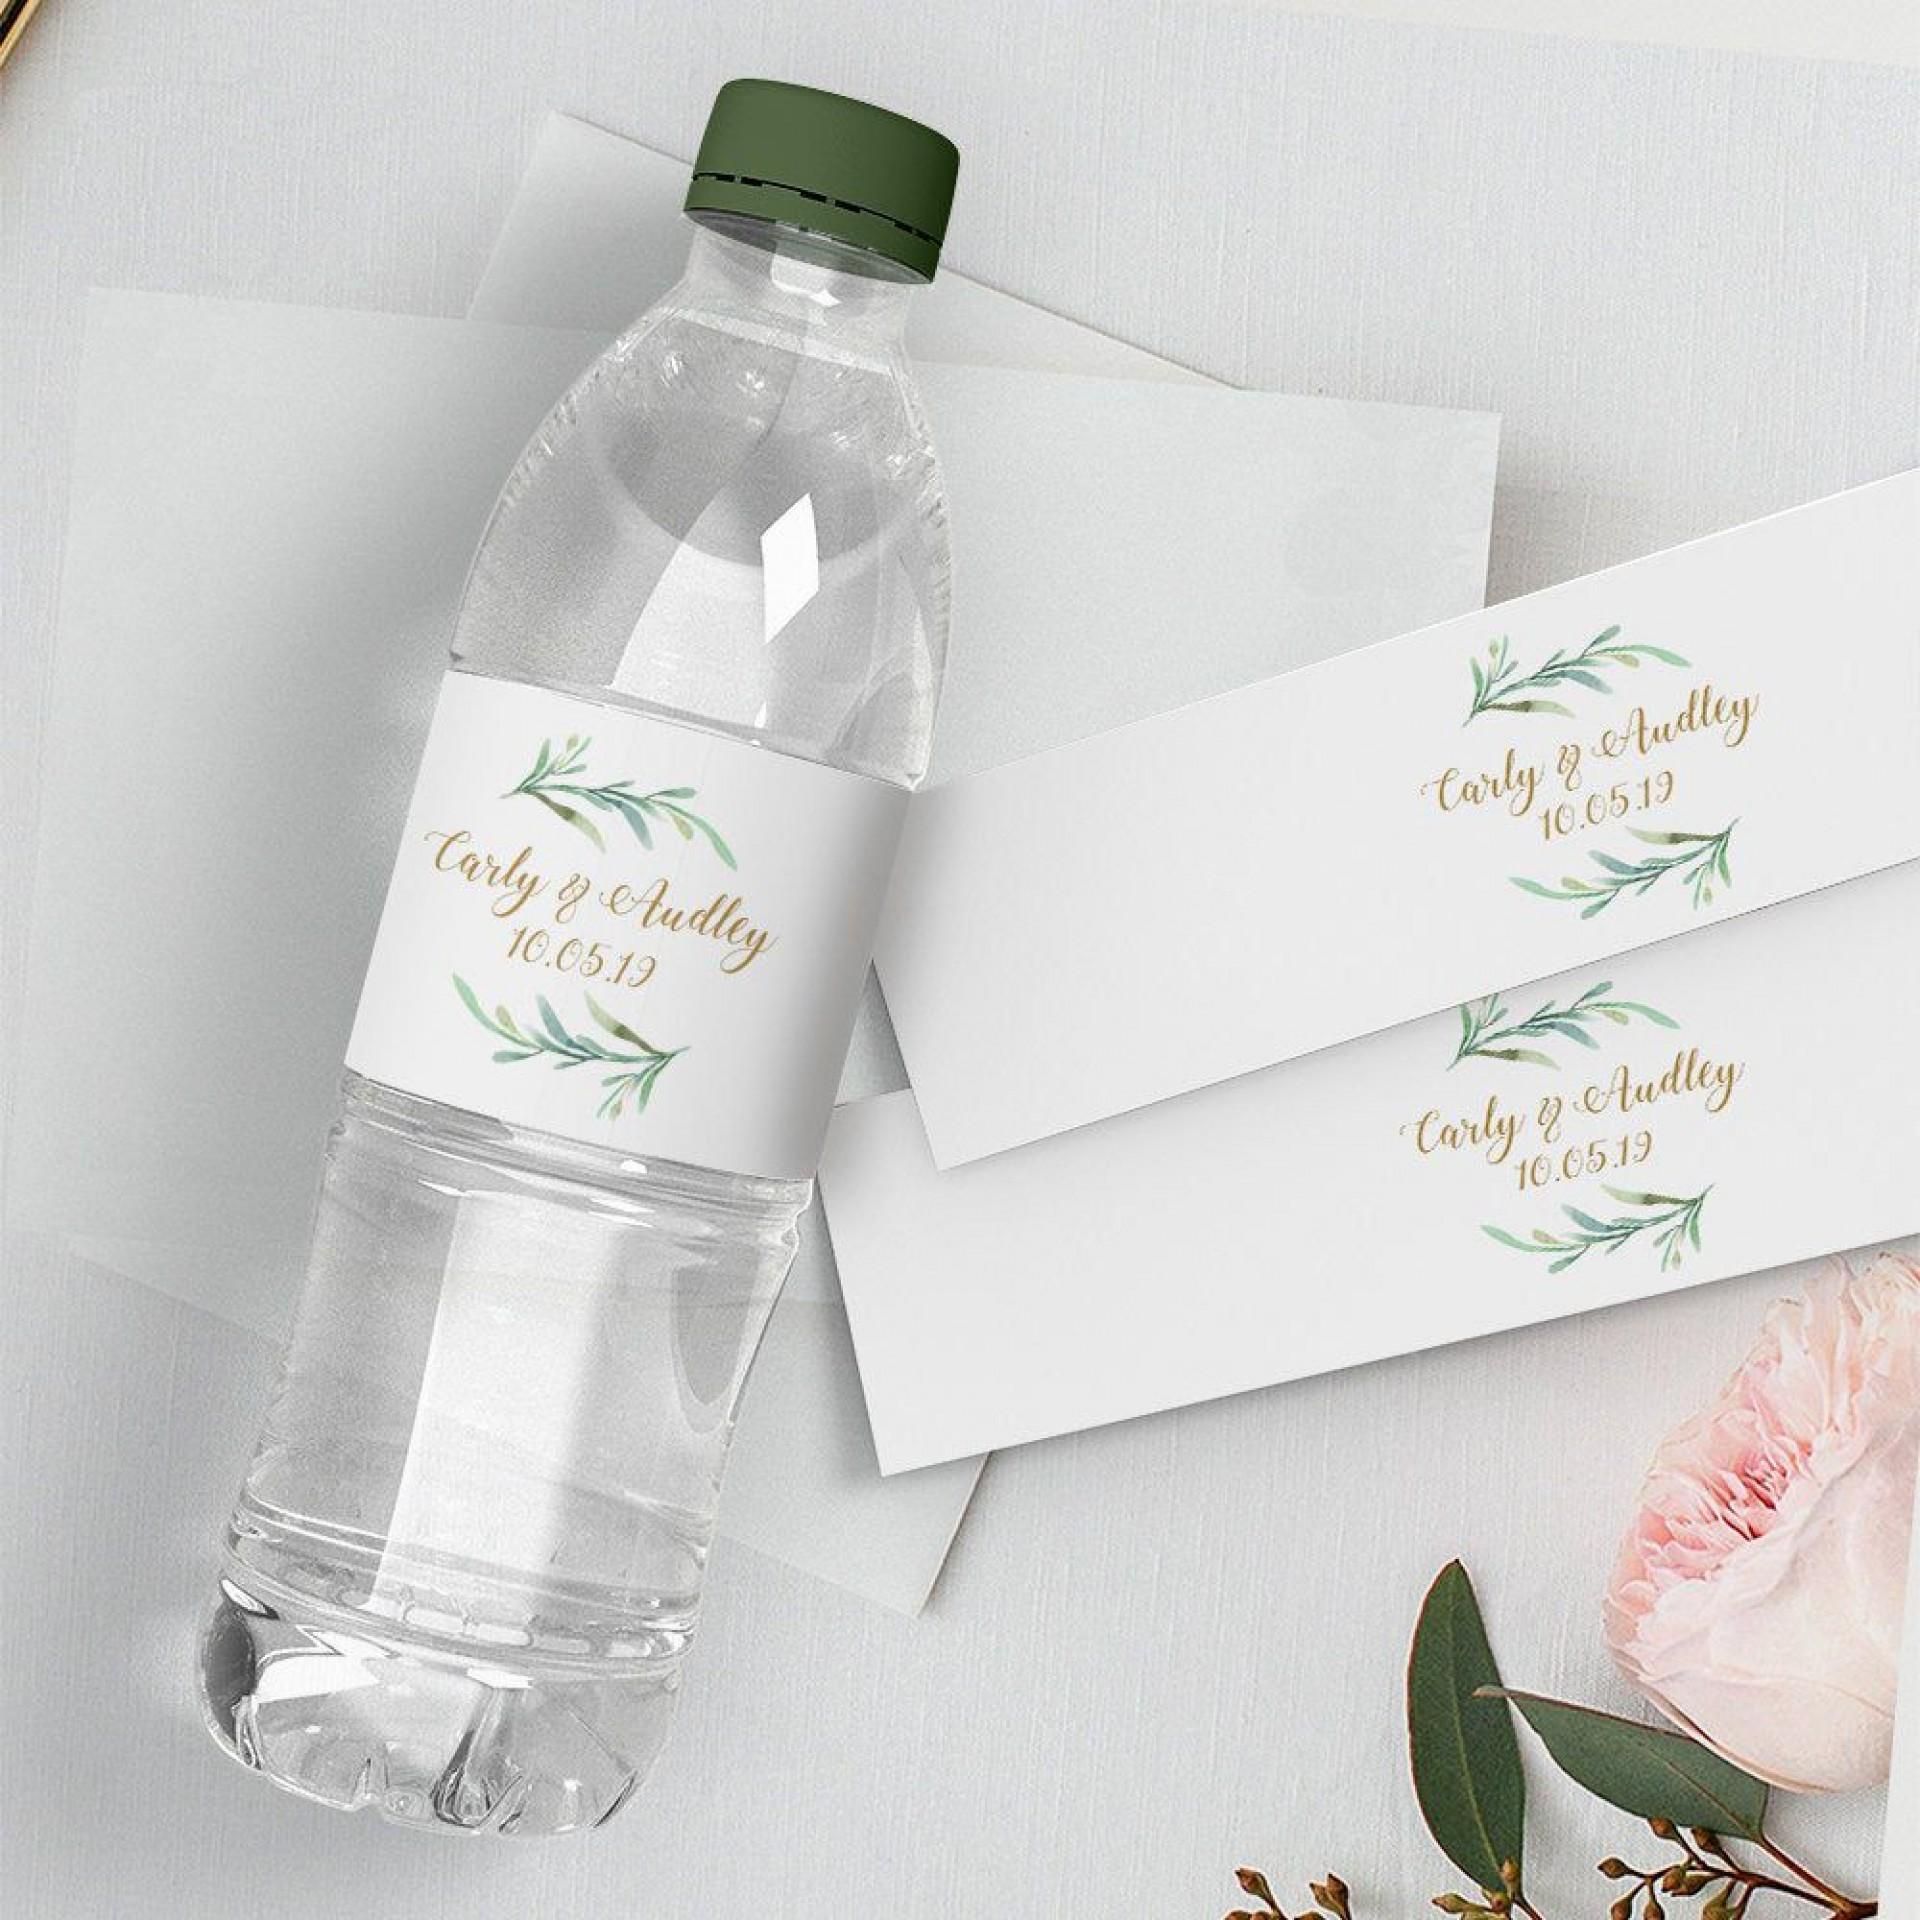 008 Impressive Free Wedding Template For Word Water Bottle Label Image  Labels1920